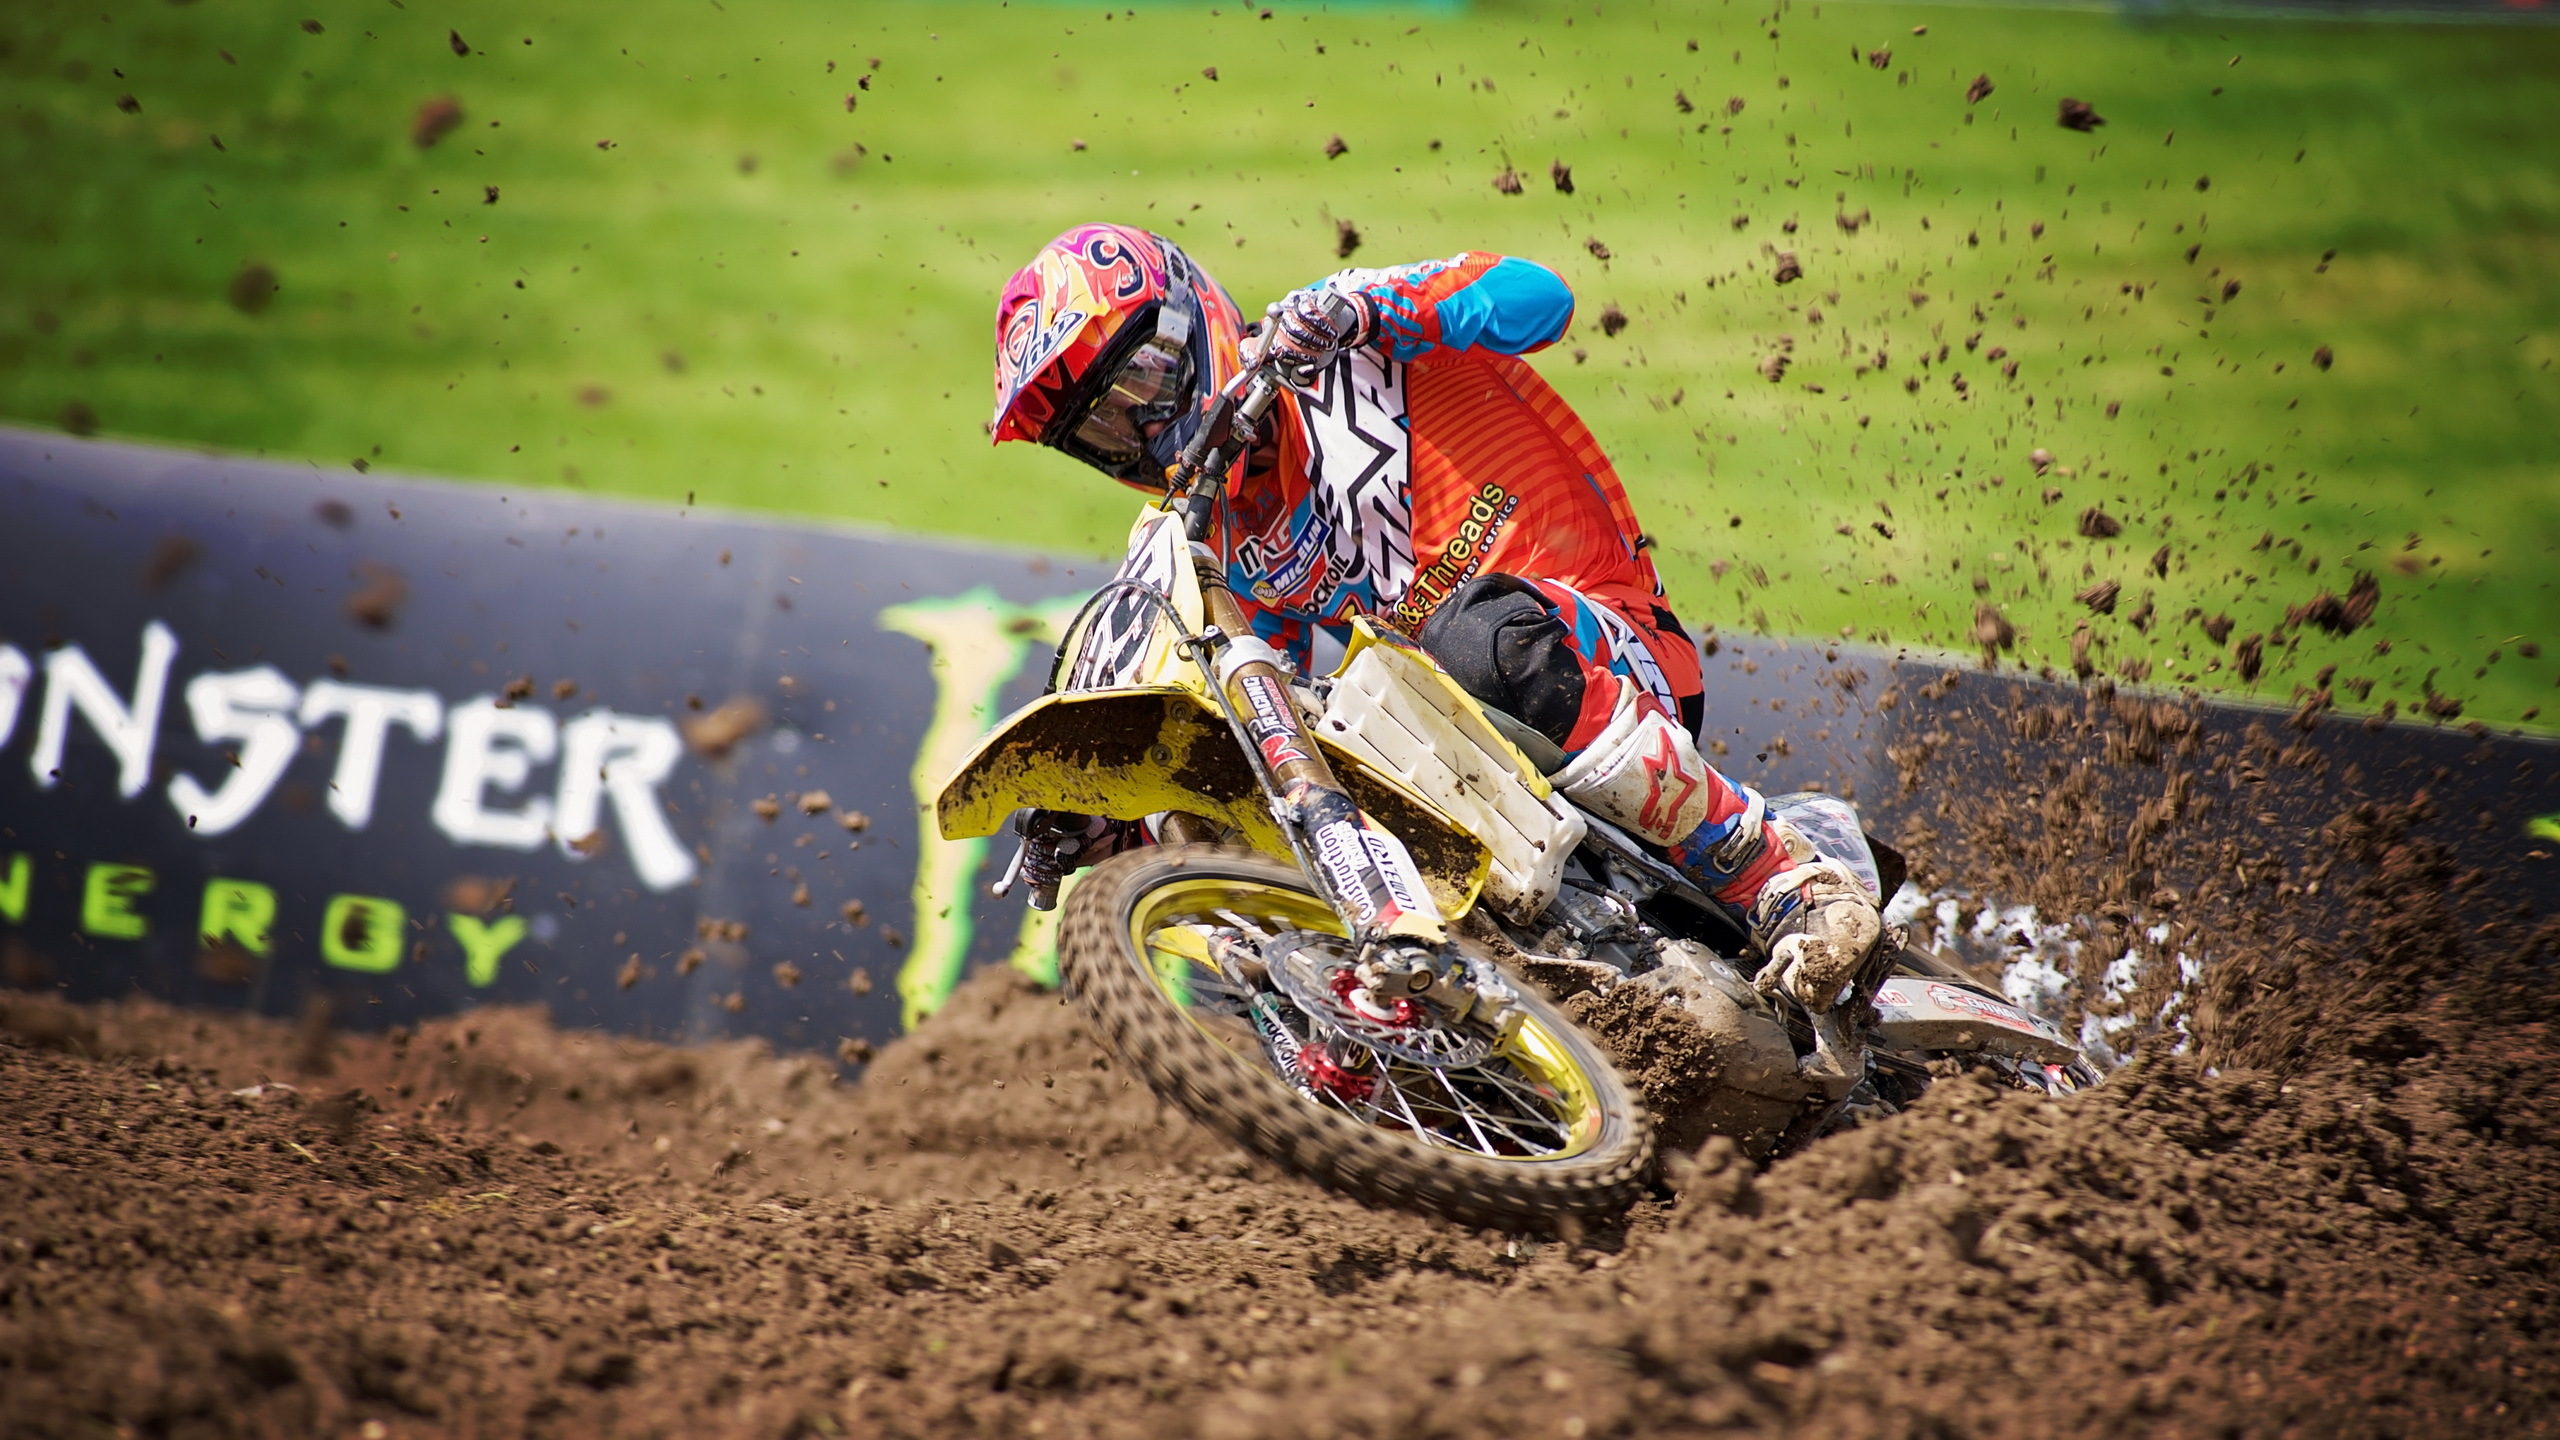 спорт мотоцикл гонка sports motorcycle race  № 3296437 без смс